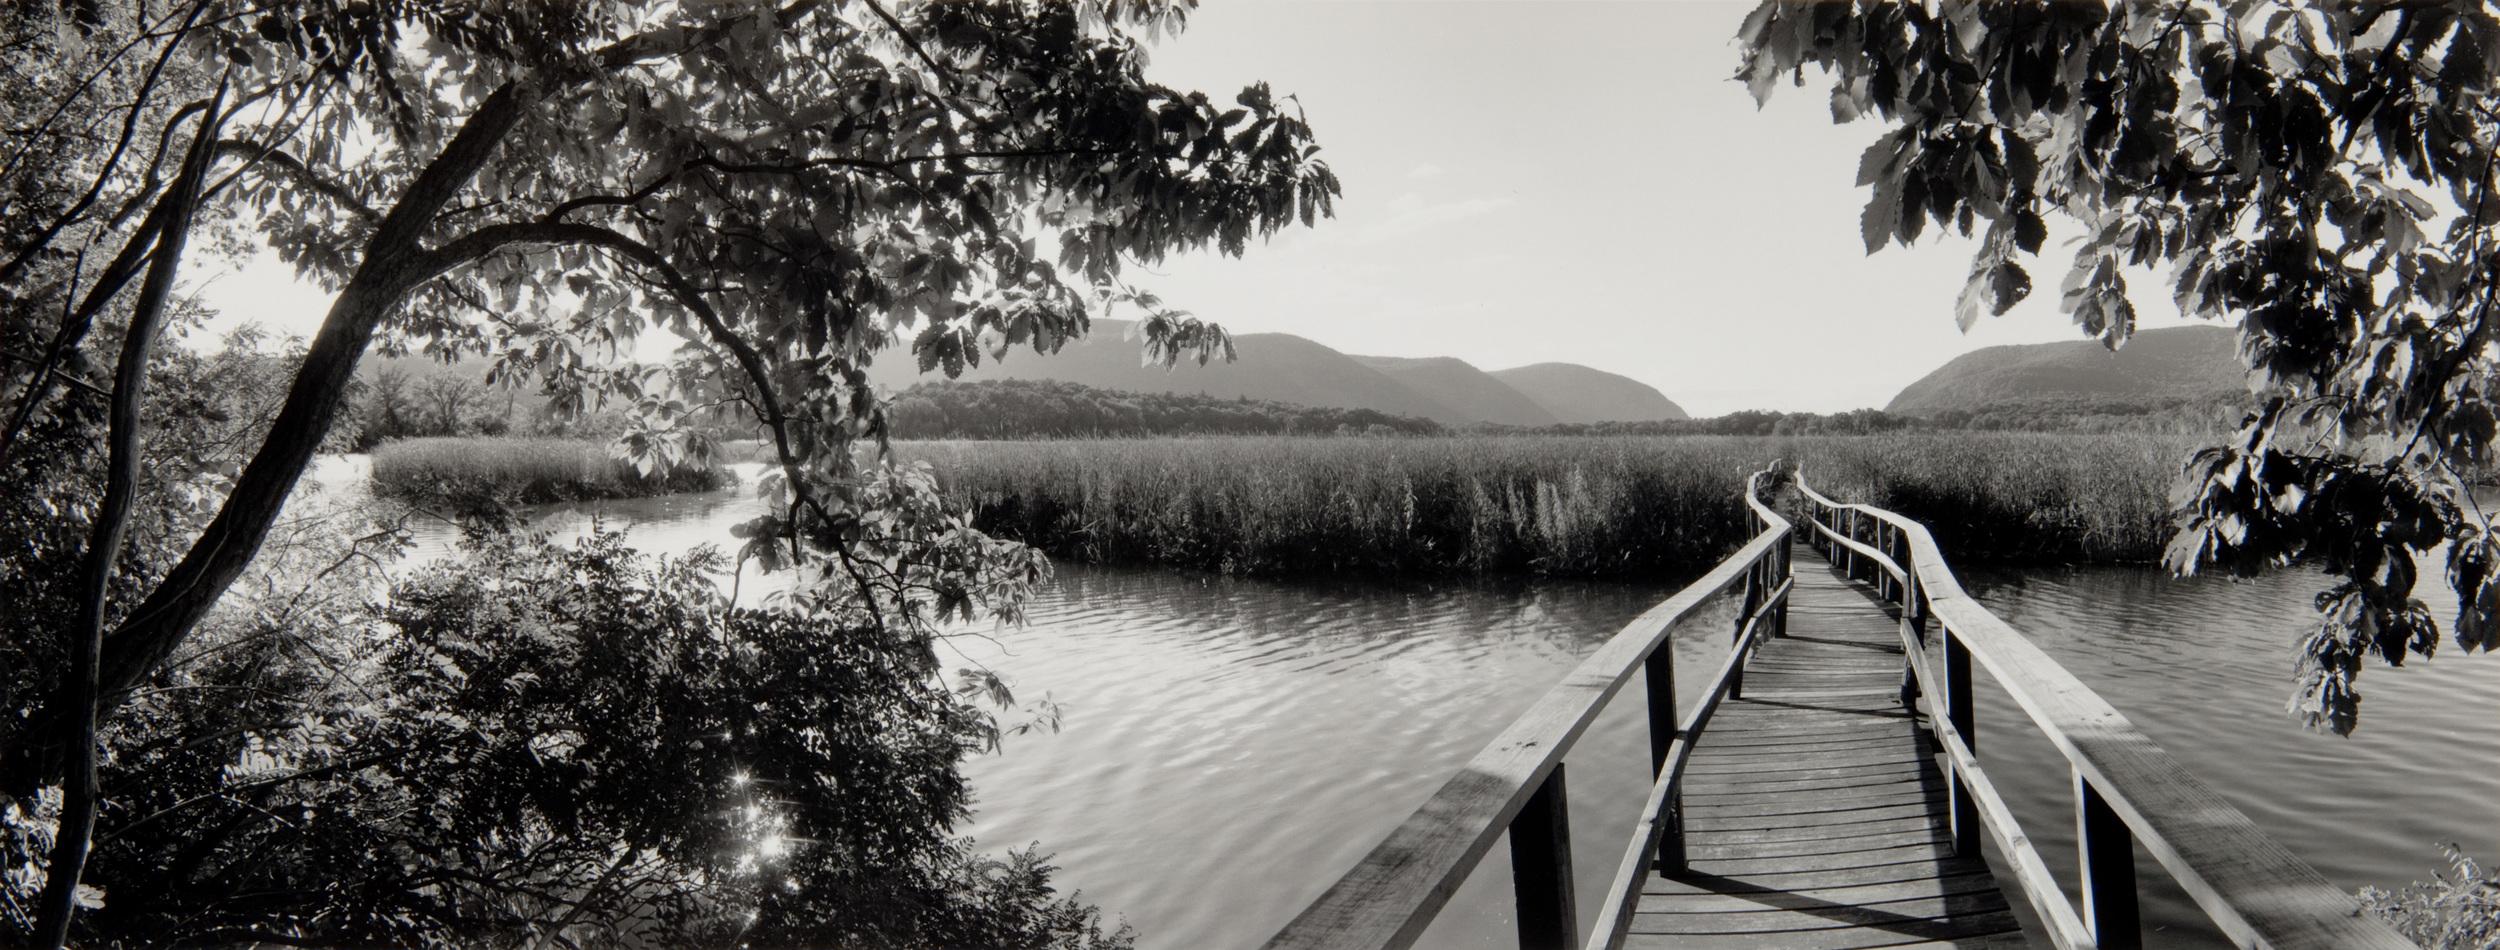 E. Lindbloom, Constitution Marsh, Cold Springs, 1995, gsp.jpg